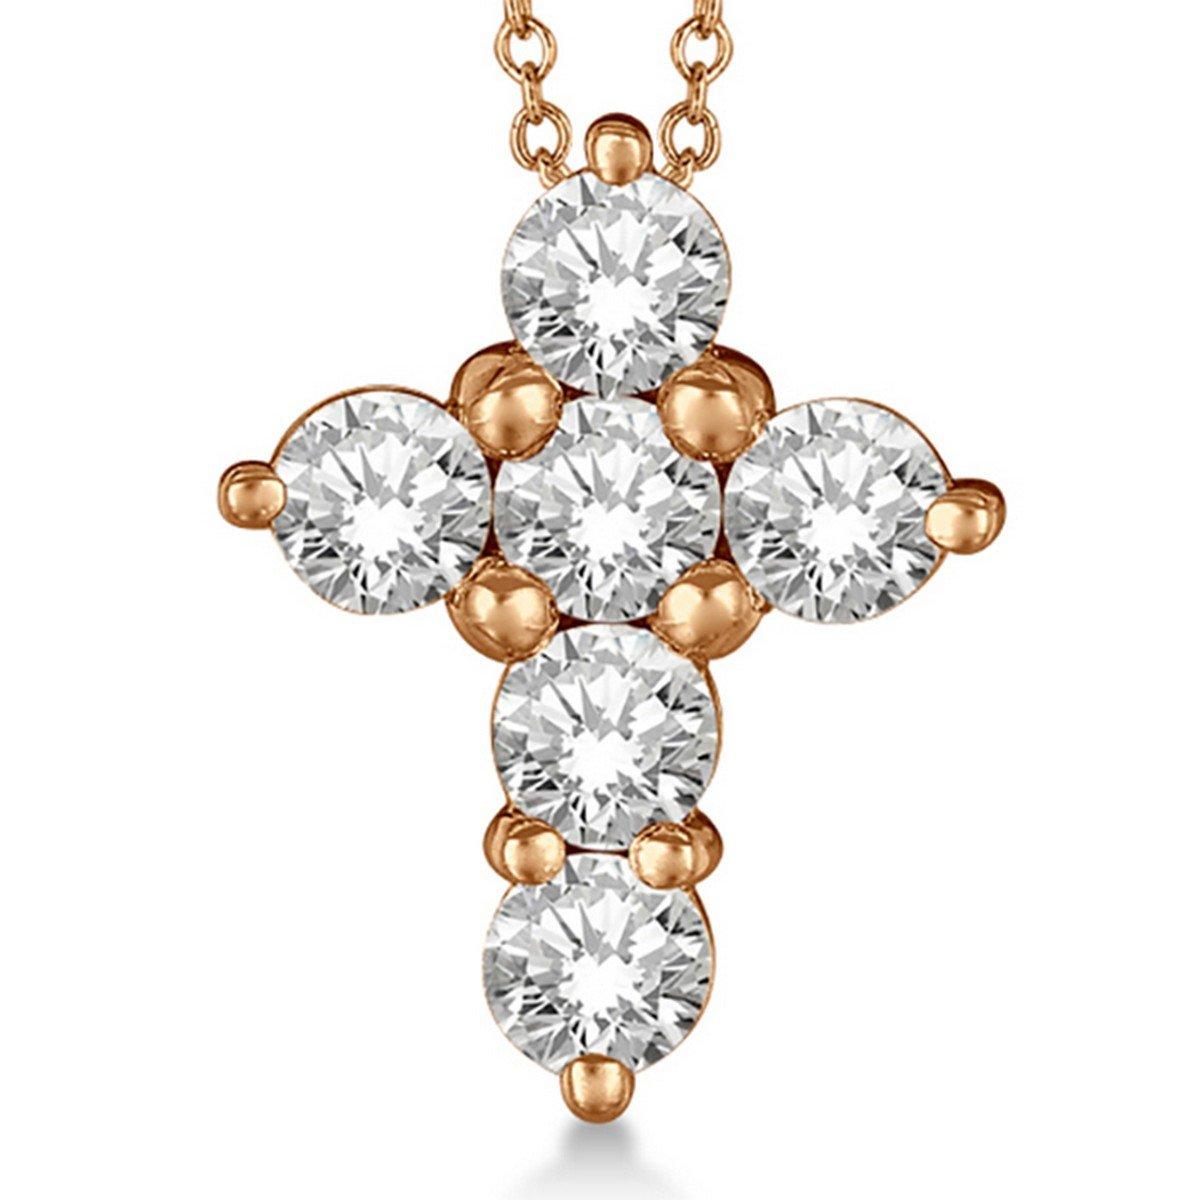 Yellow Gold 14K Pear Shape Created Diamond Pendant  2.05 ct.